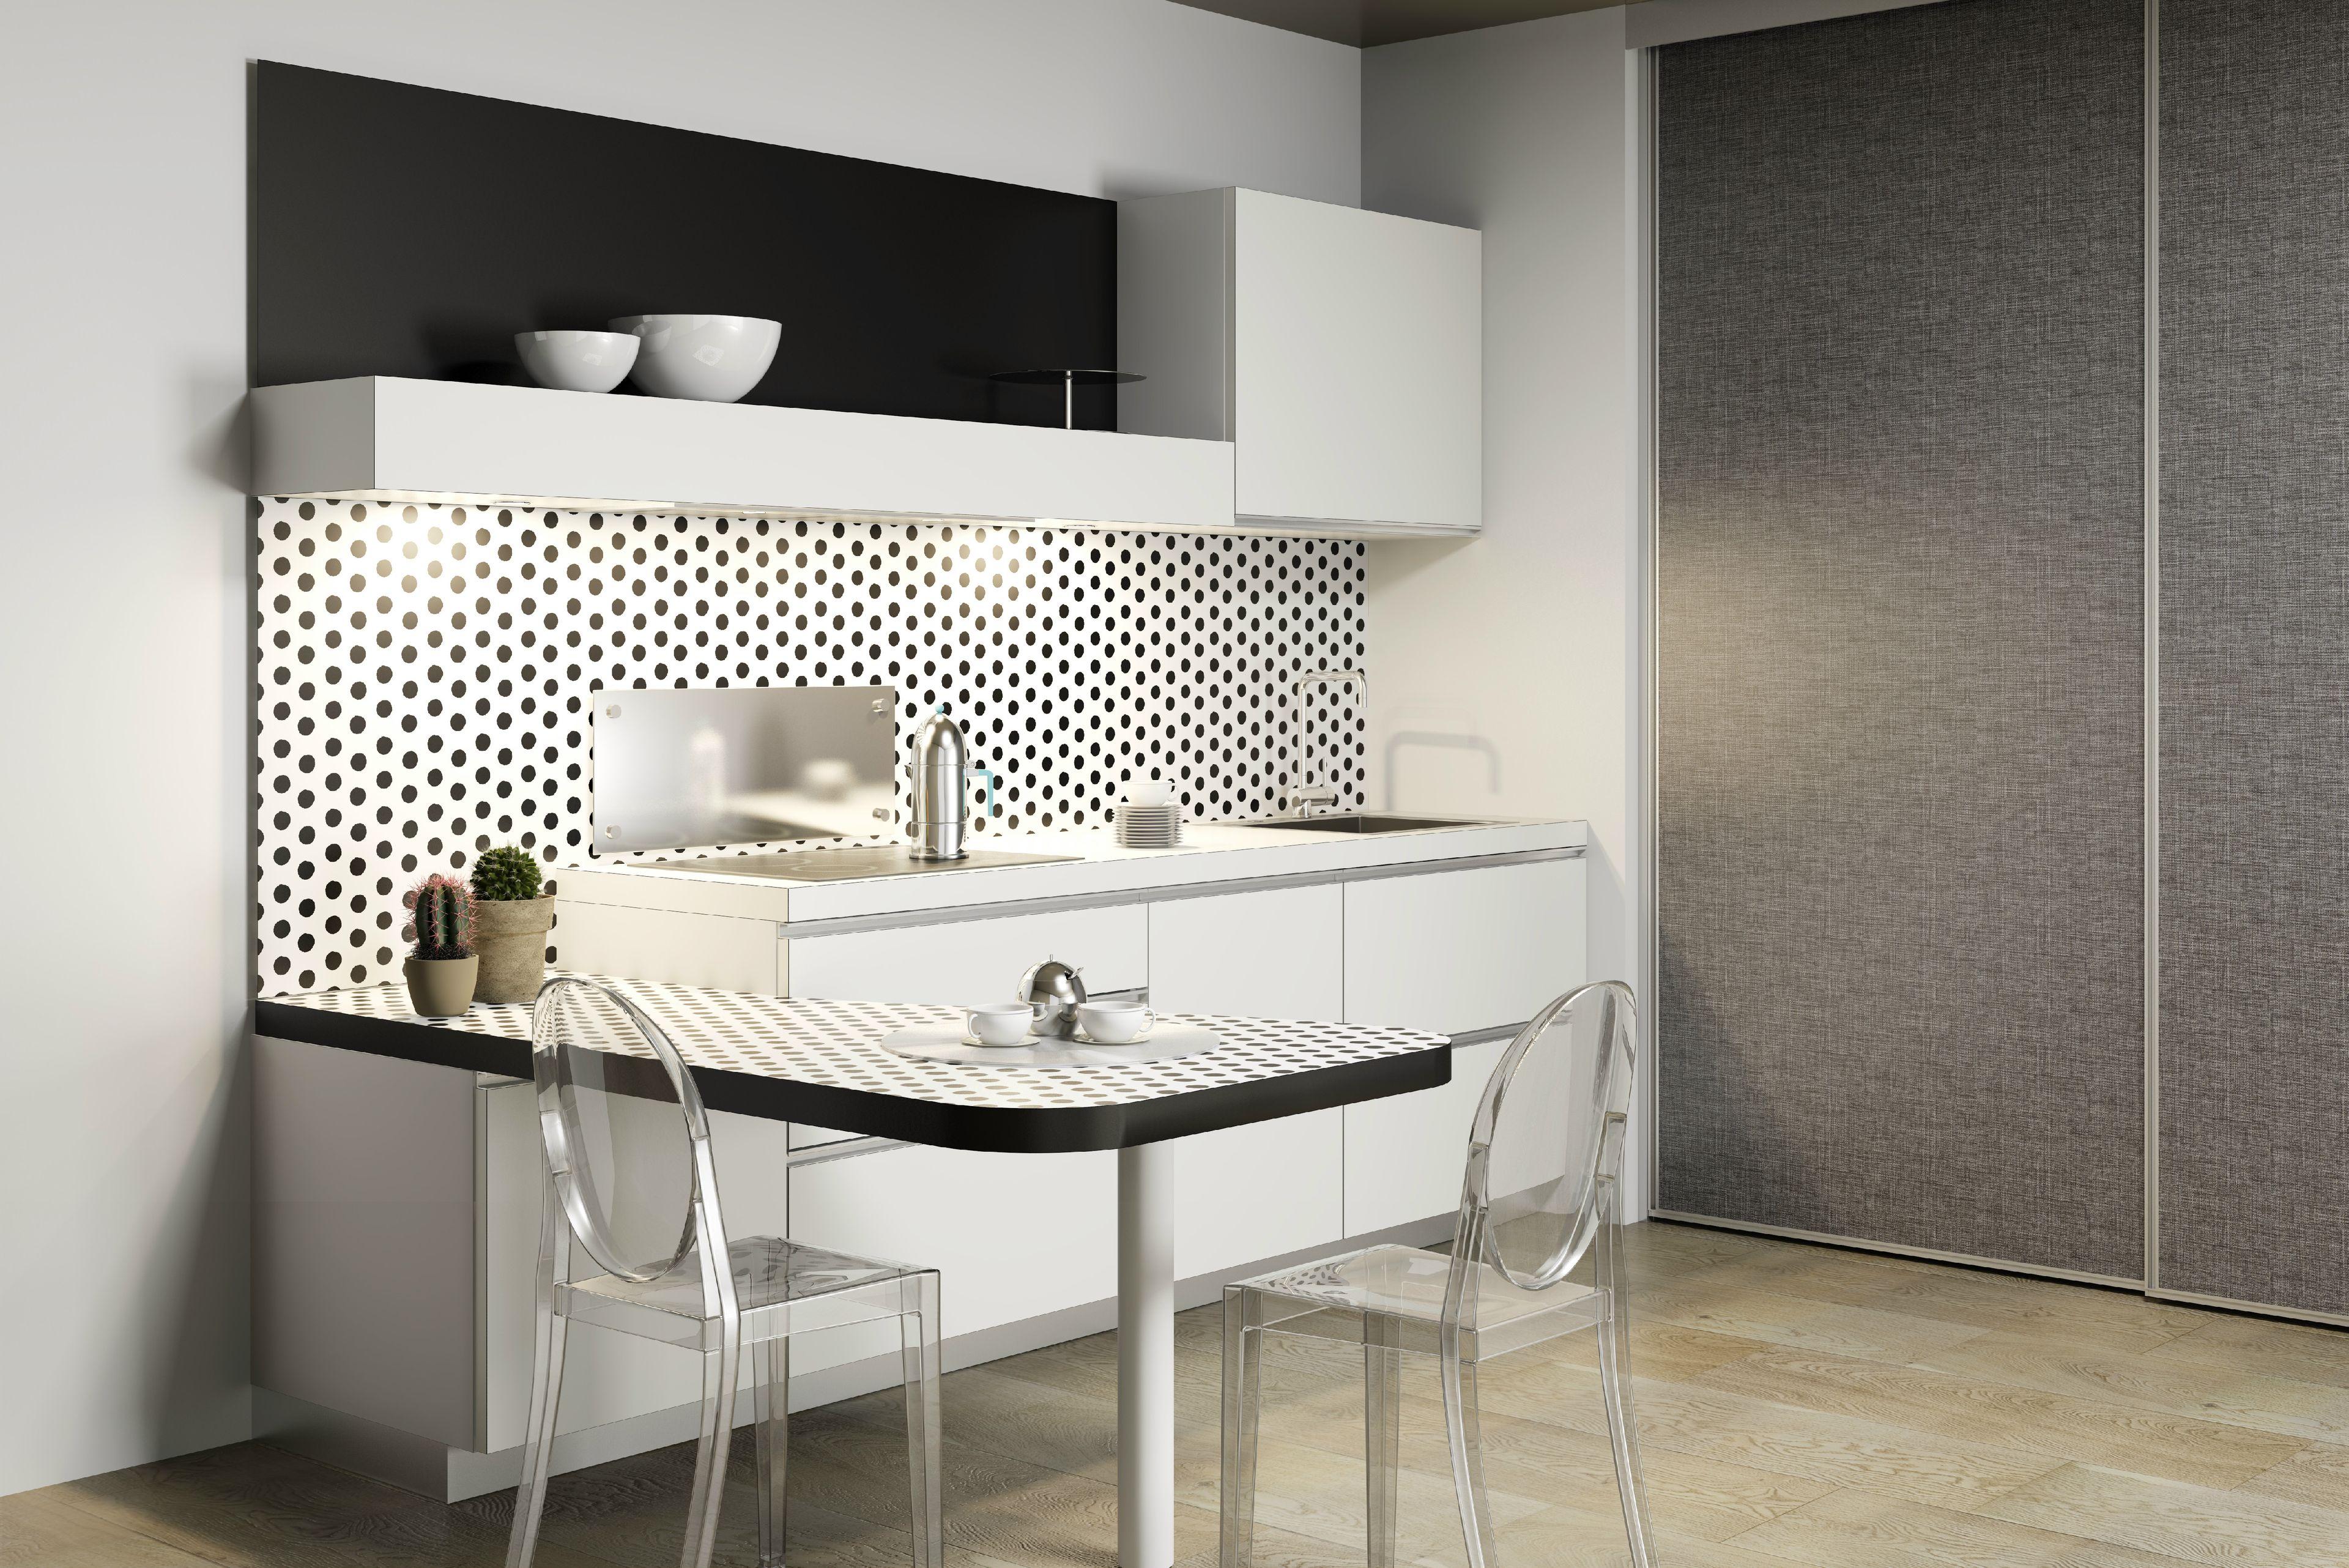 Tavolo isola dwg design casa creativa e mobili ispiratori - Ikea penisola cucina ...